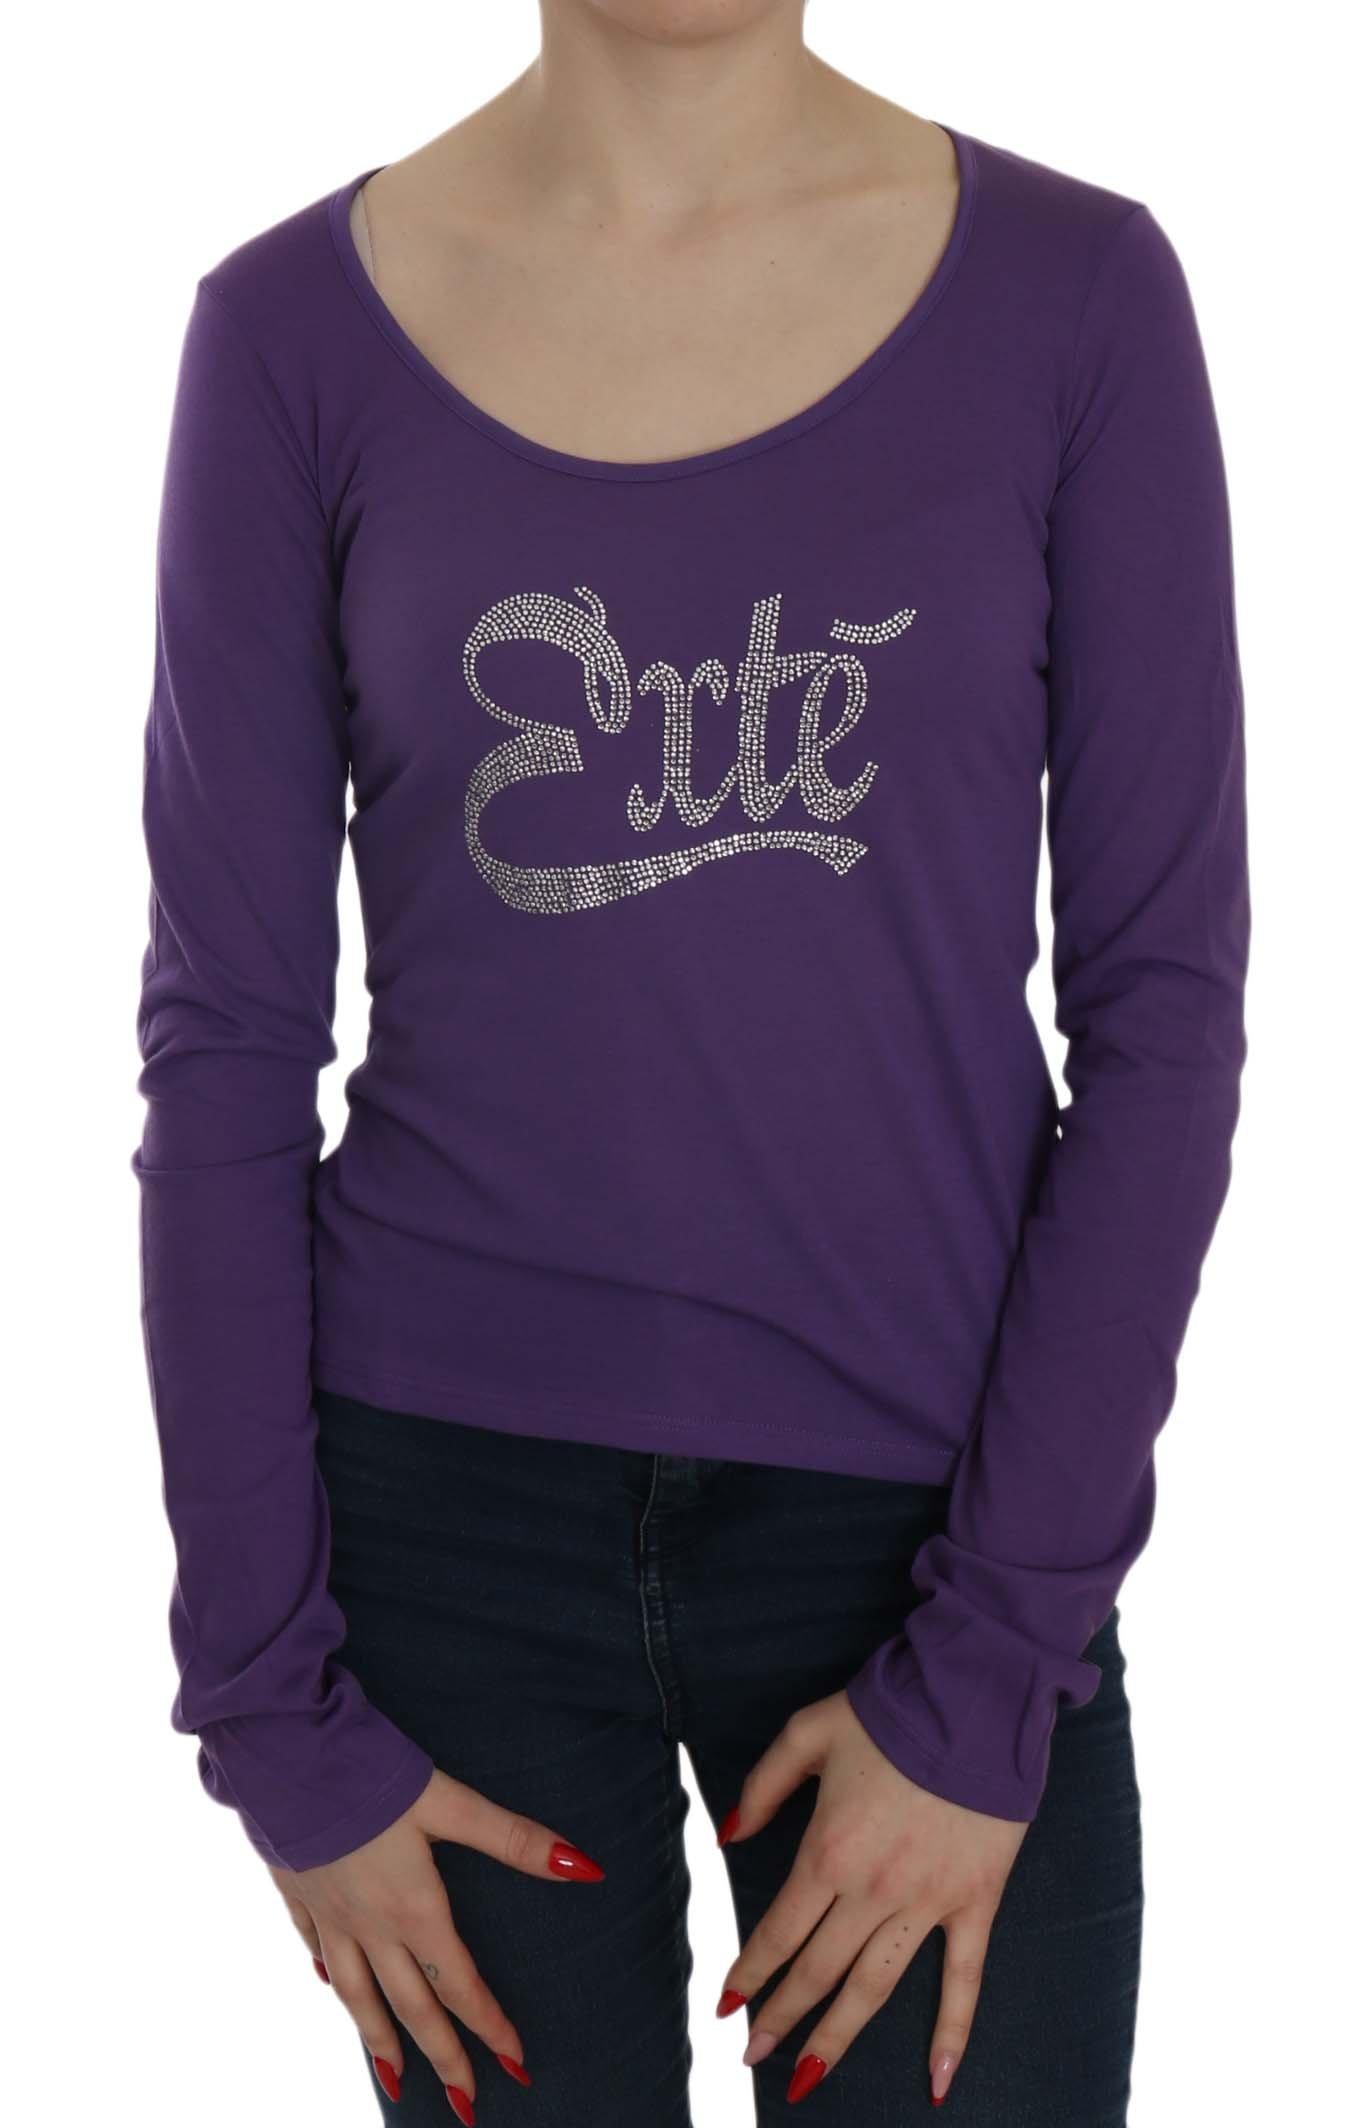 Exte Women's Crystal Embellished LS Casual Top Purple TSH3908 - IT38 XS